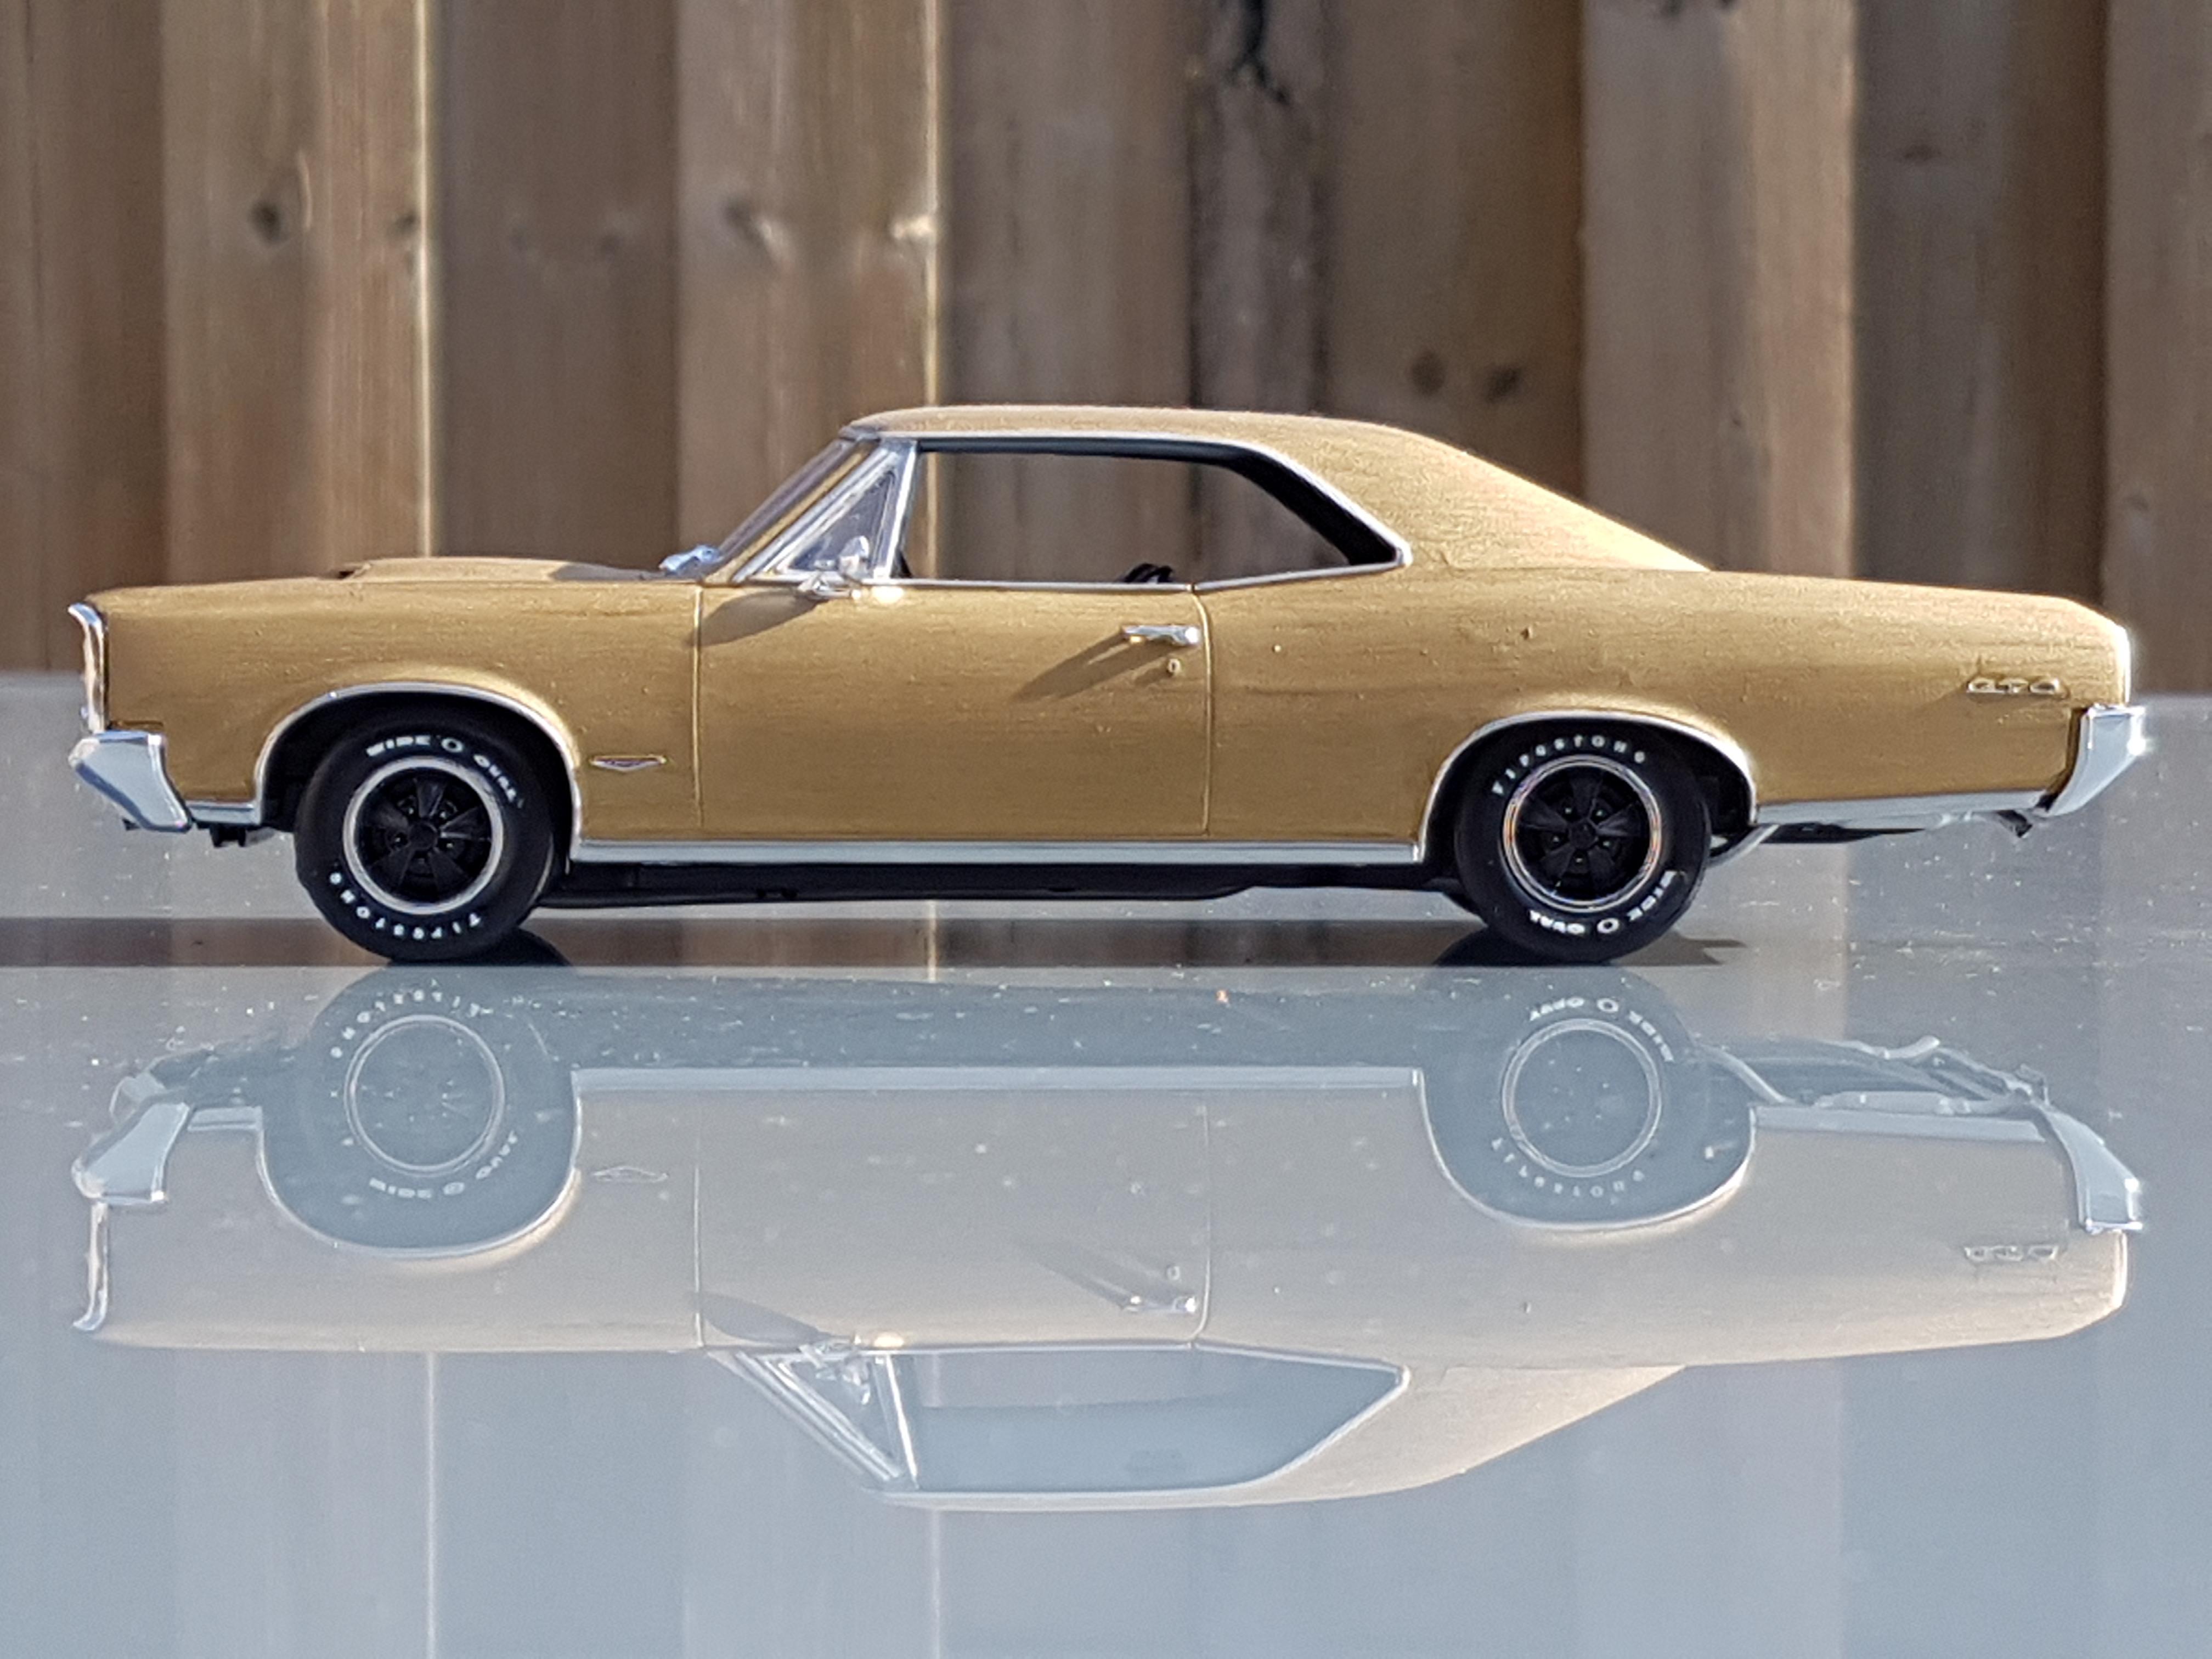 1966 pontiac gto revell rays kits. Black Bedroom Furniture Sets. Home Design Ideas